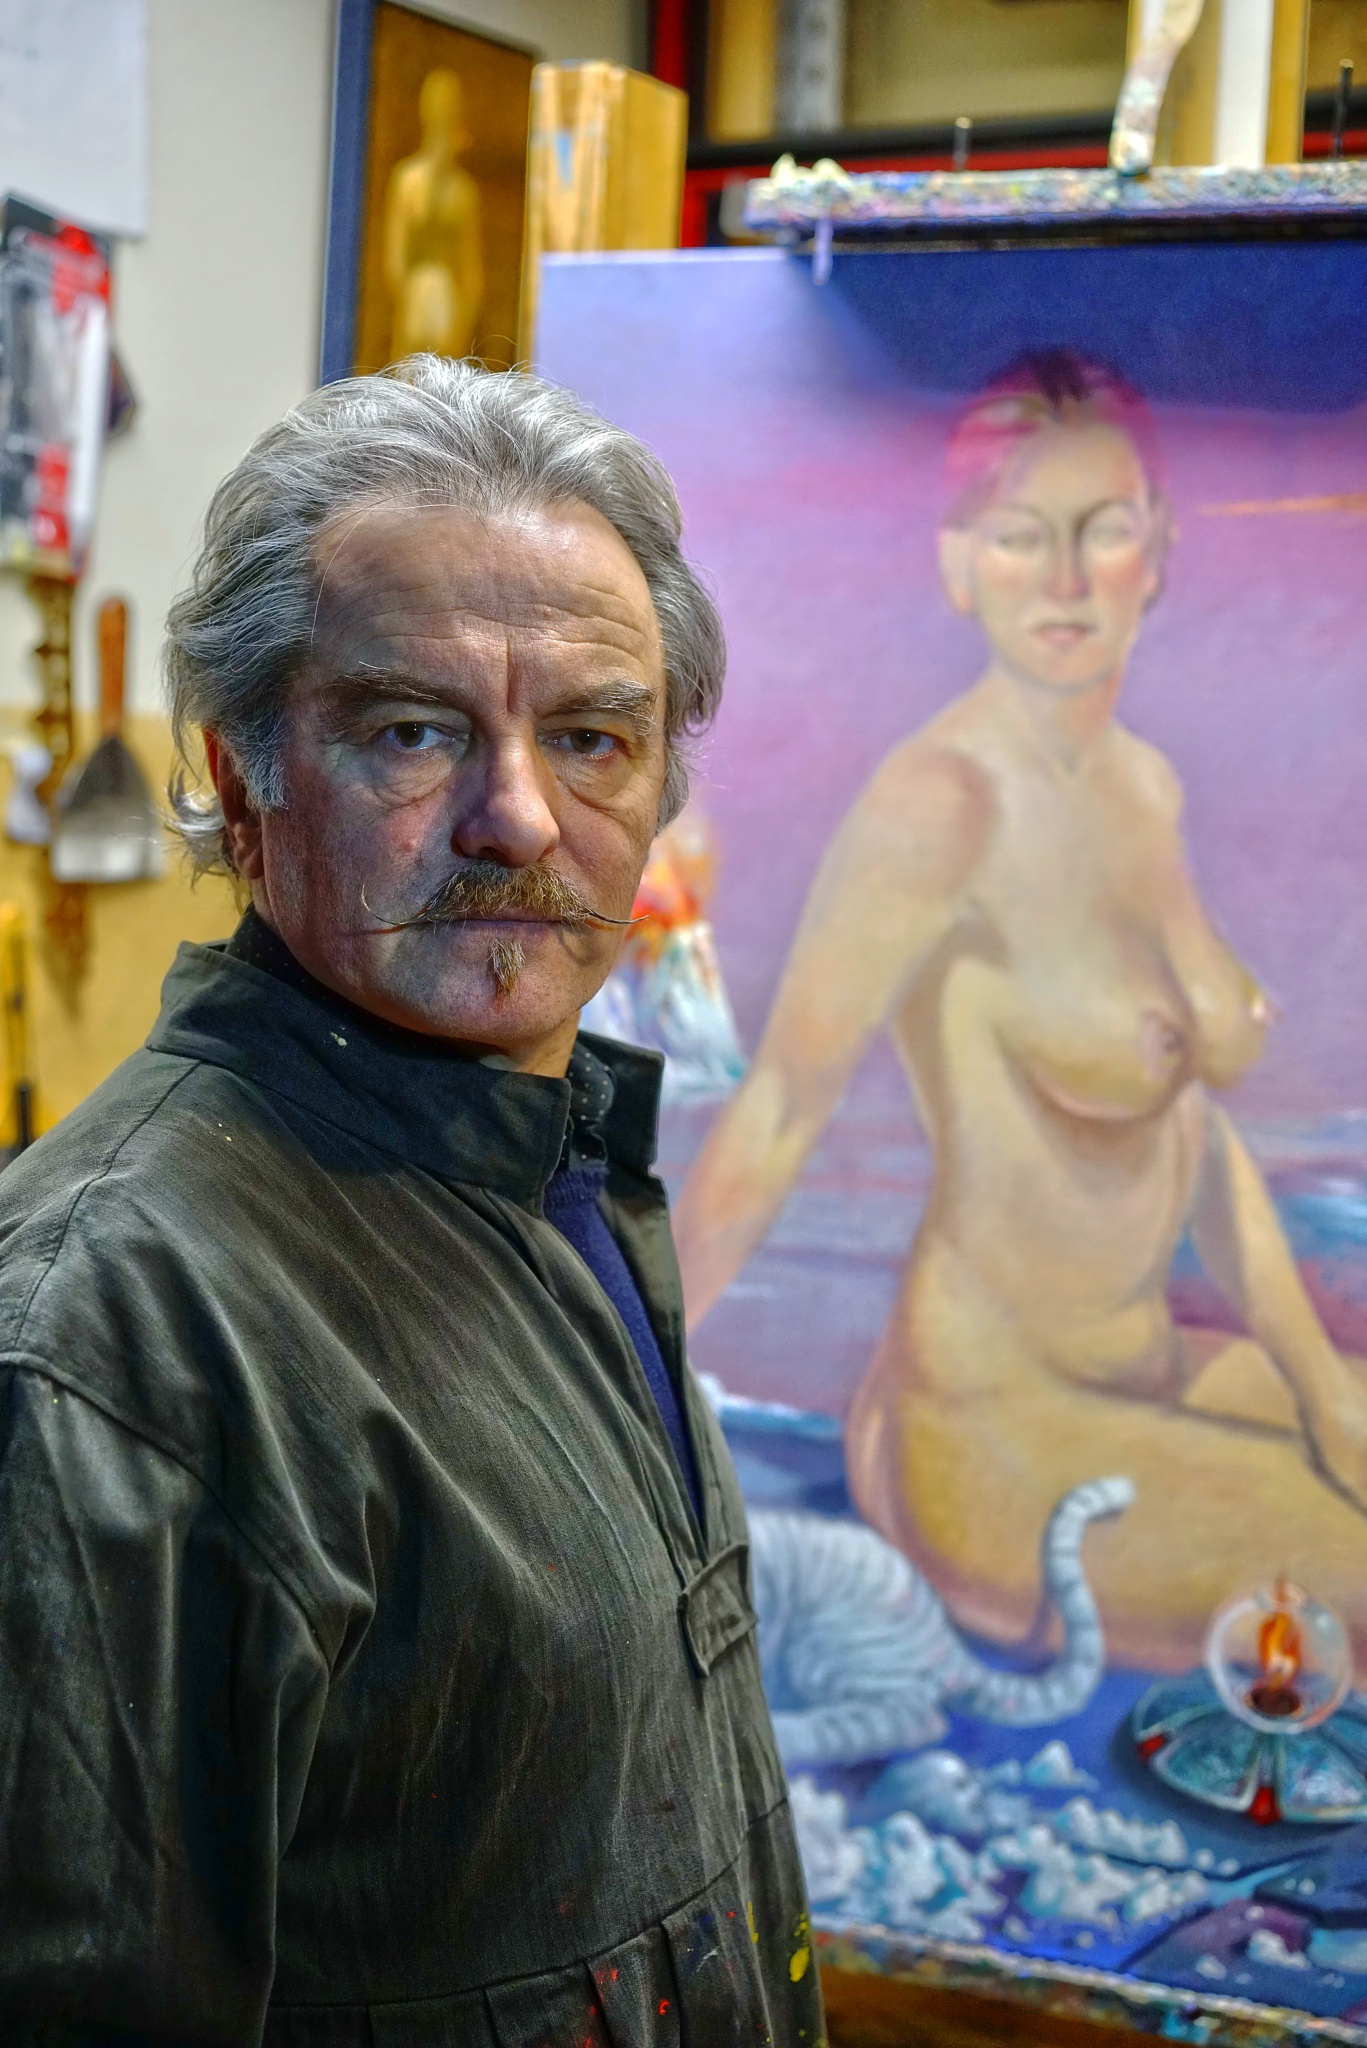 Painter Danilo by Goran Jorganovich